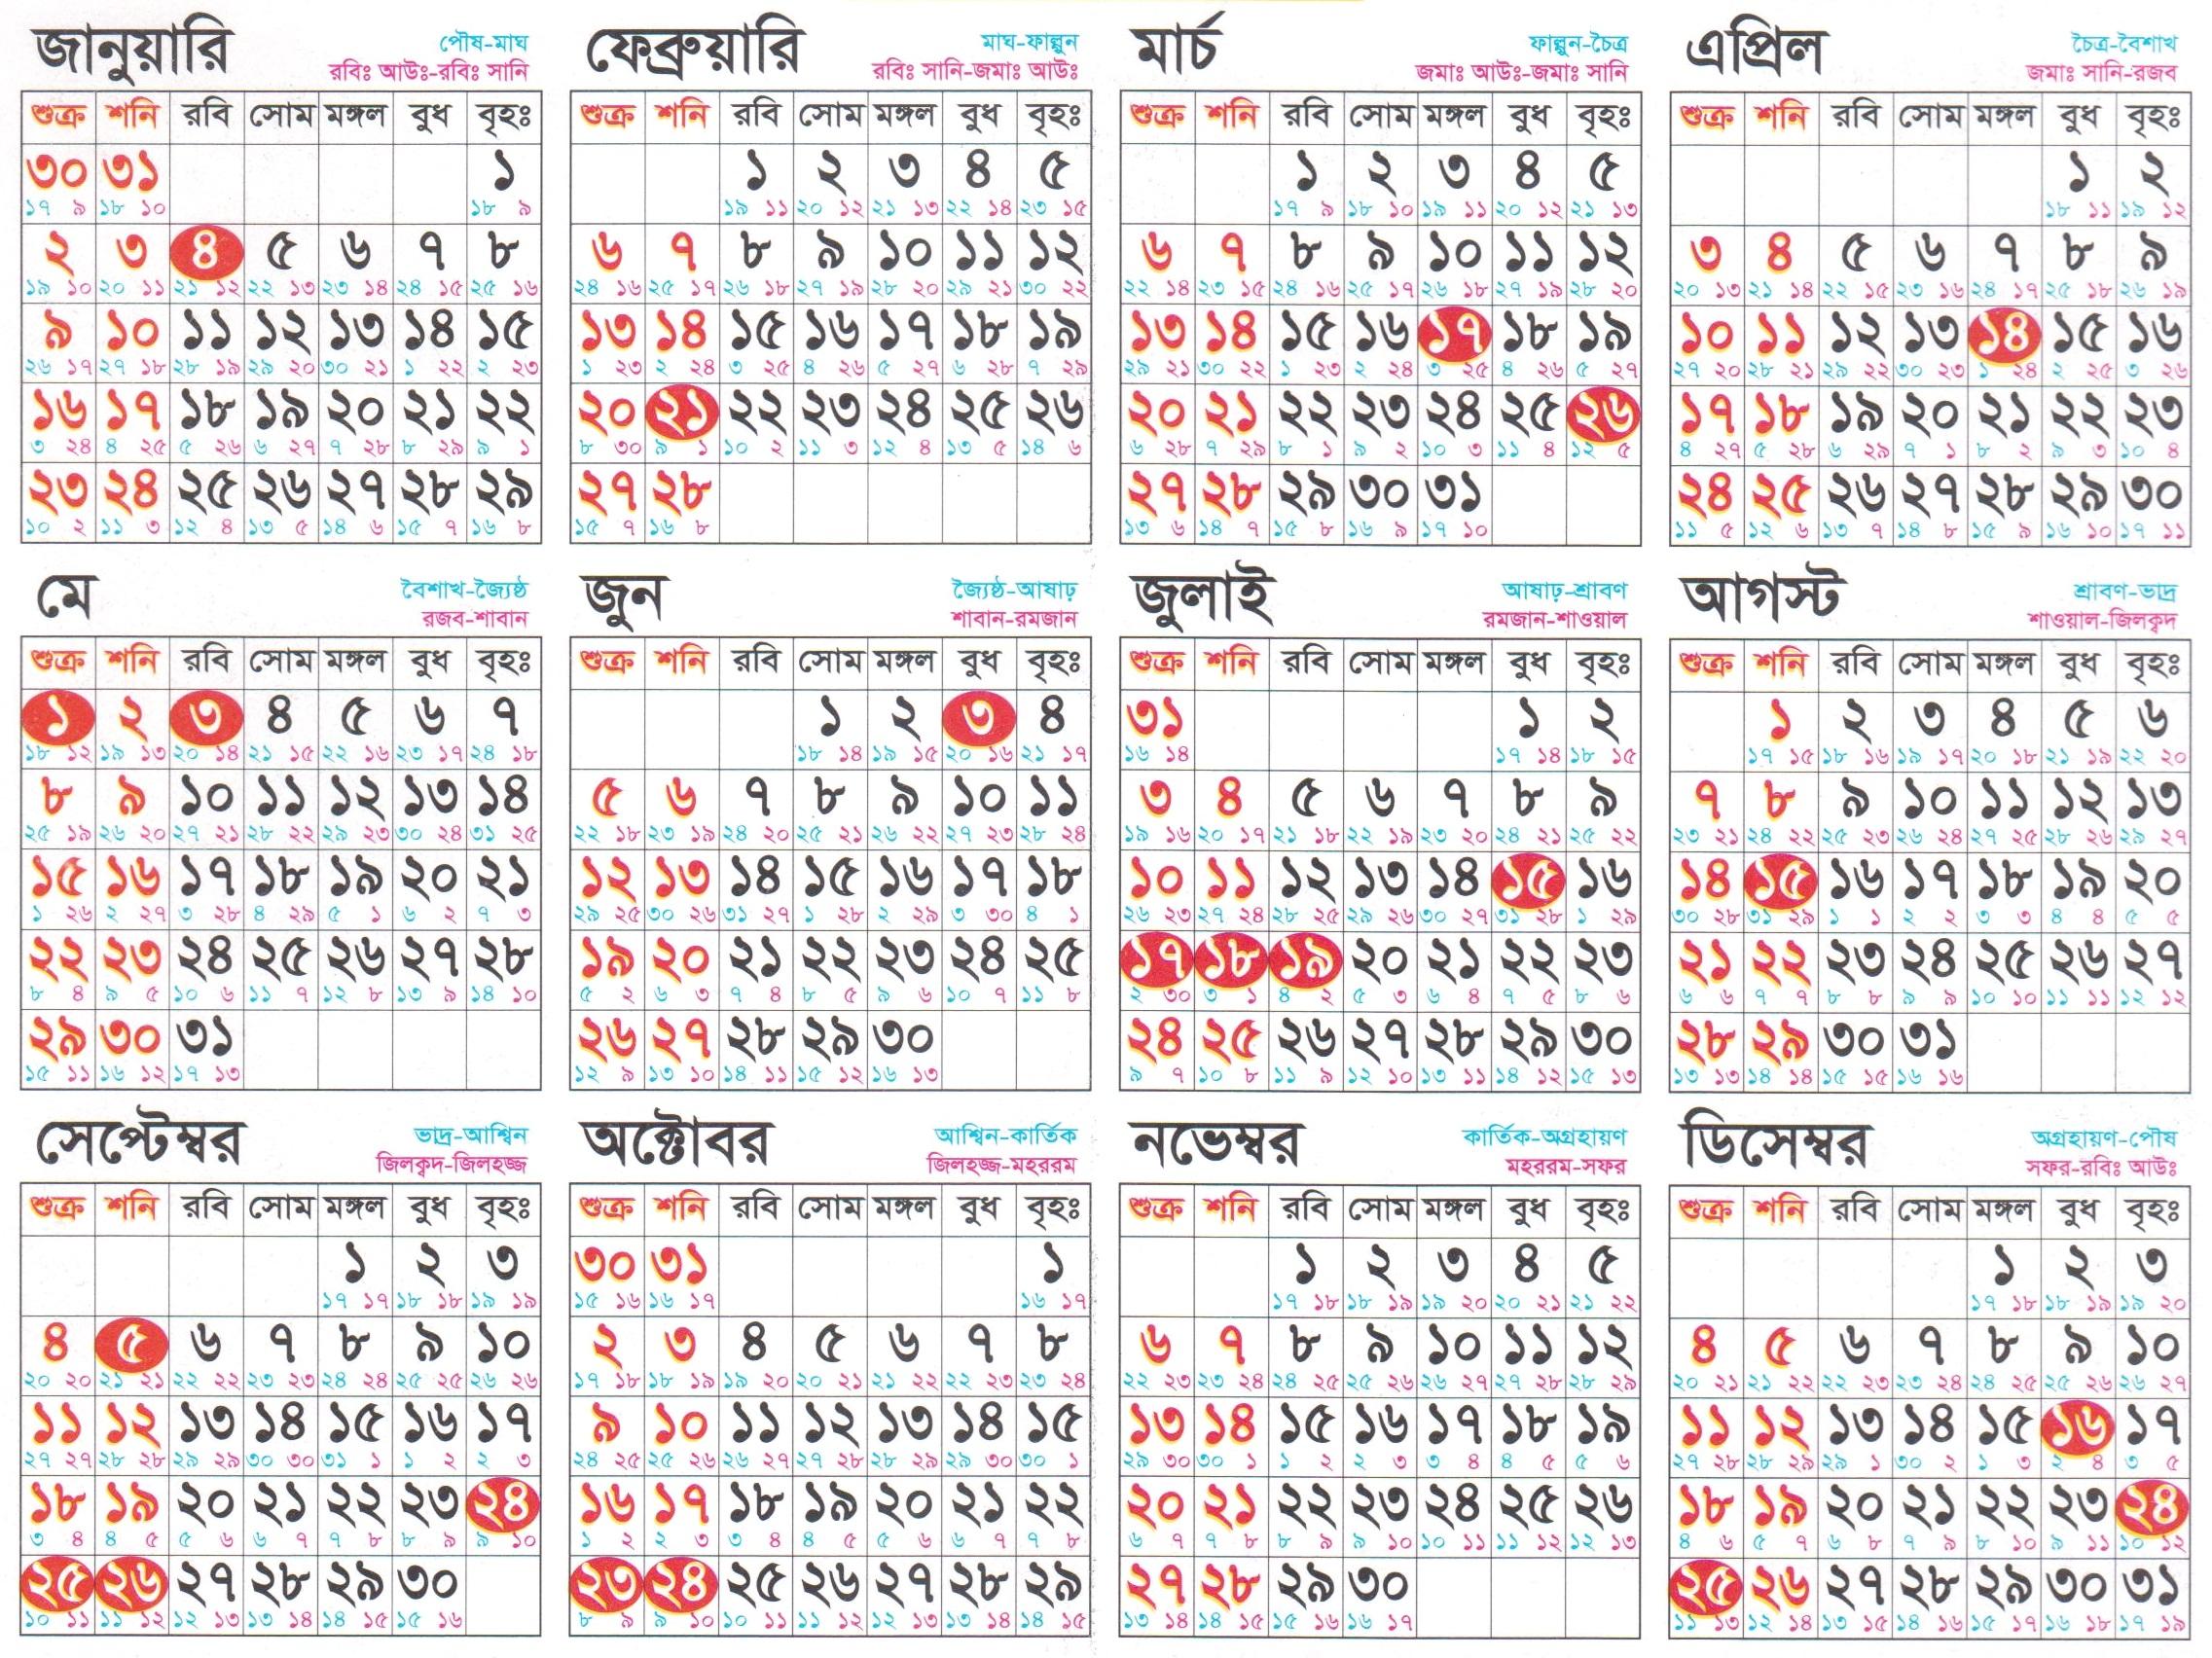 Calendar Bangla : Bangl clandae search results calendar